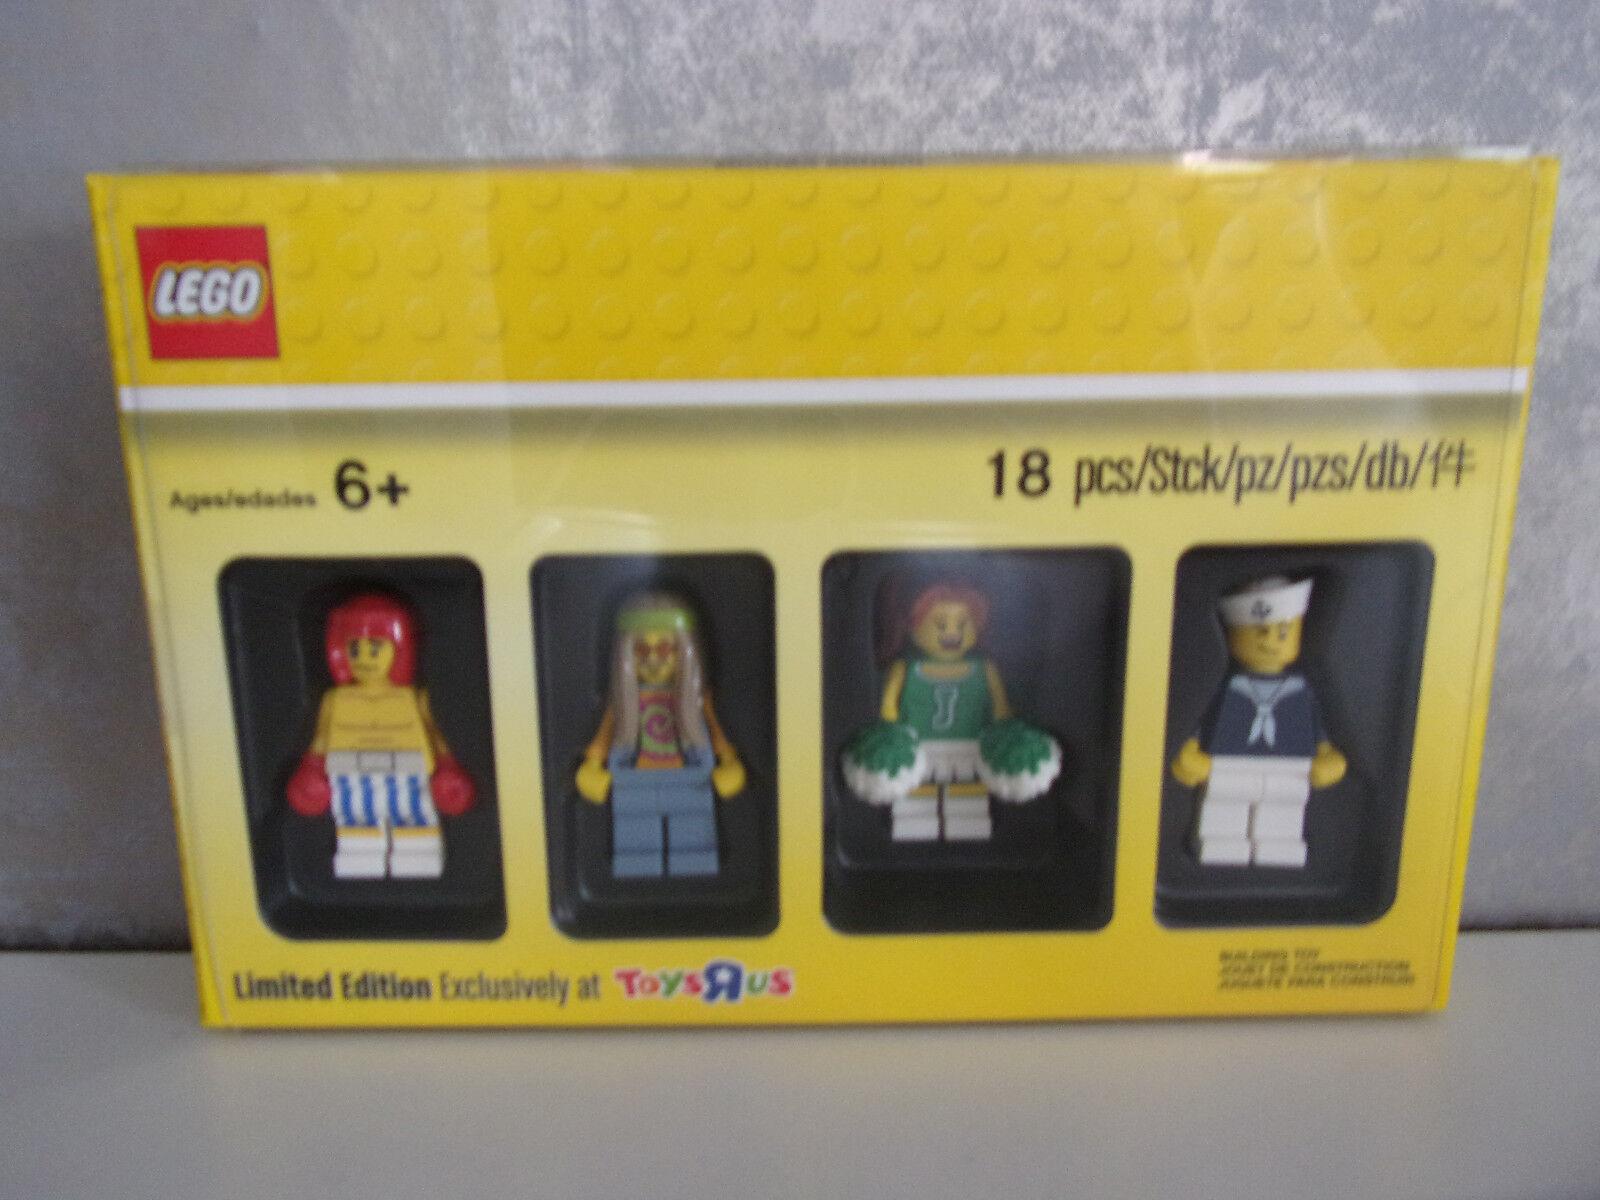 Lego 5004941 minifiguras-set-Limited minifiguras-set-Limited minifiguras-set-Limited Edition (bricktober 2017) - nuevo embalaje original &  lo último